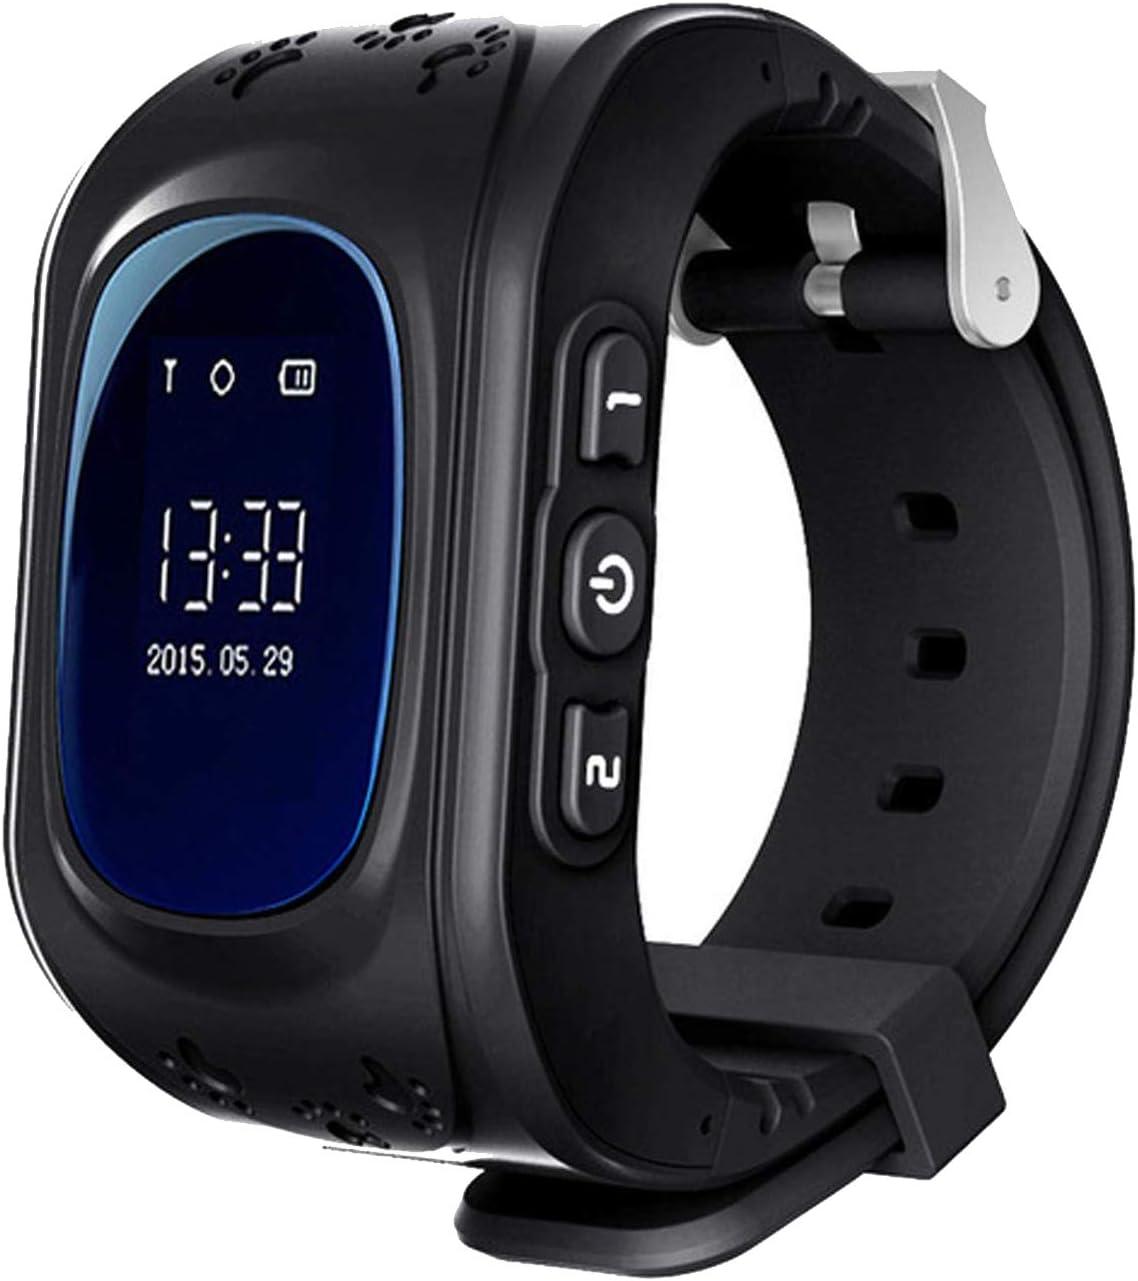 Zeerkeer Rastreador GPS Reloj Inteligente para Niños,GPS/LBS Posicionamiento en Tiempo Real Reloj SOS Antipérdida Reloj Inteligente para Niños